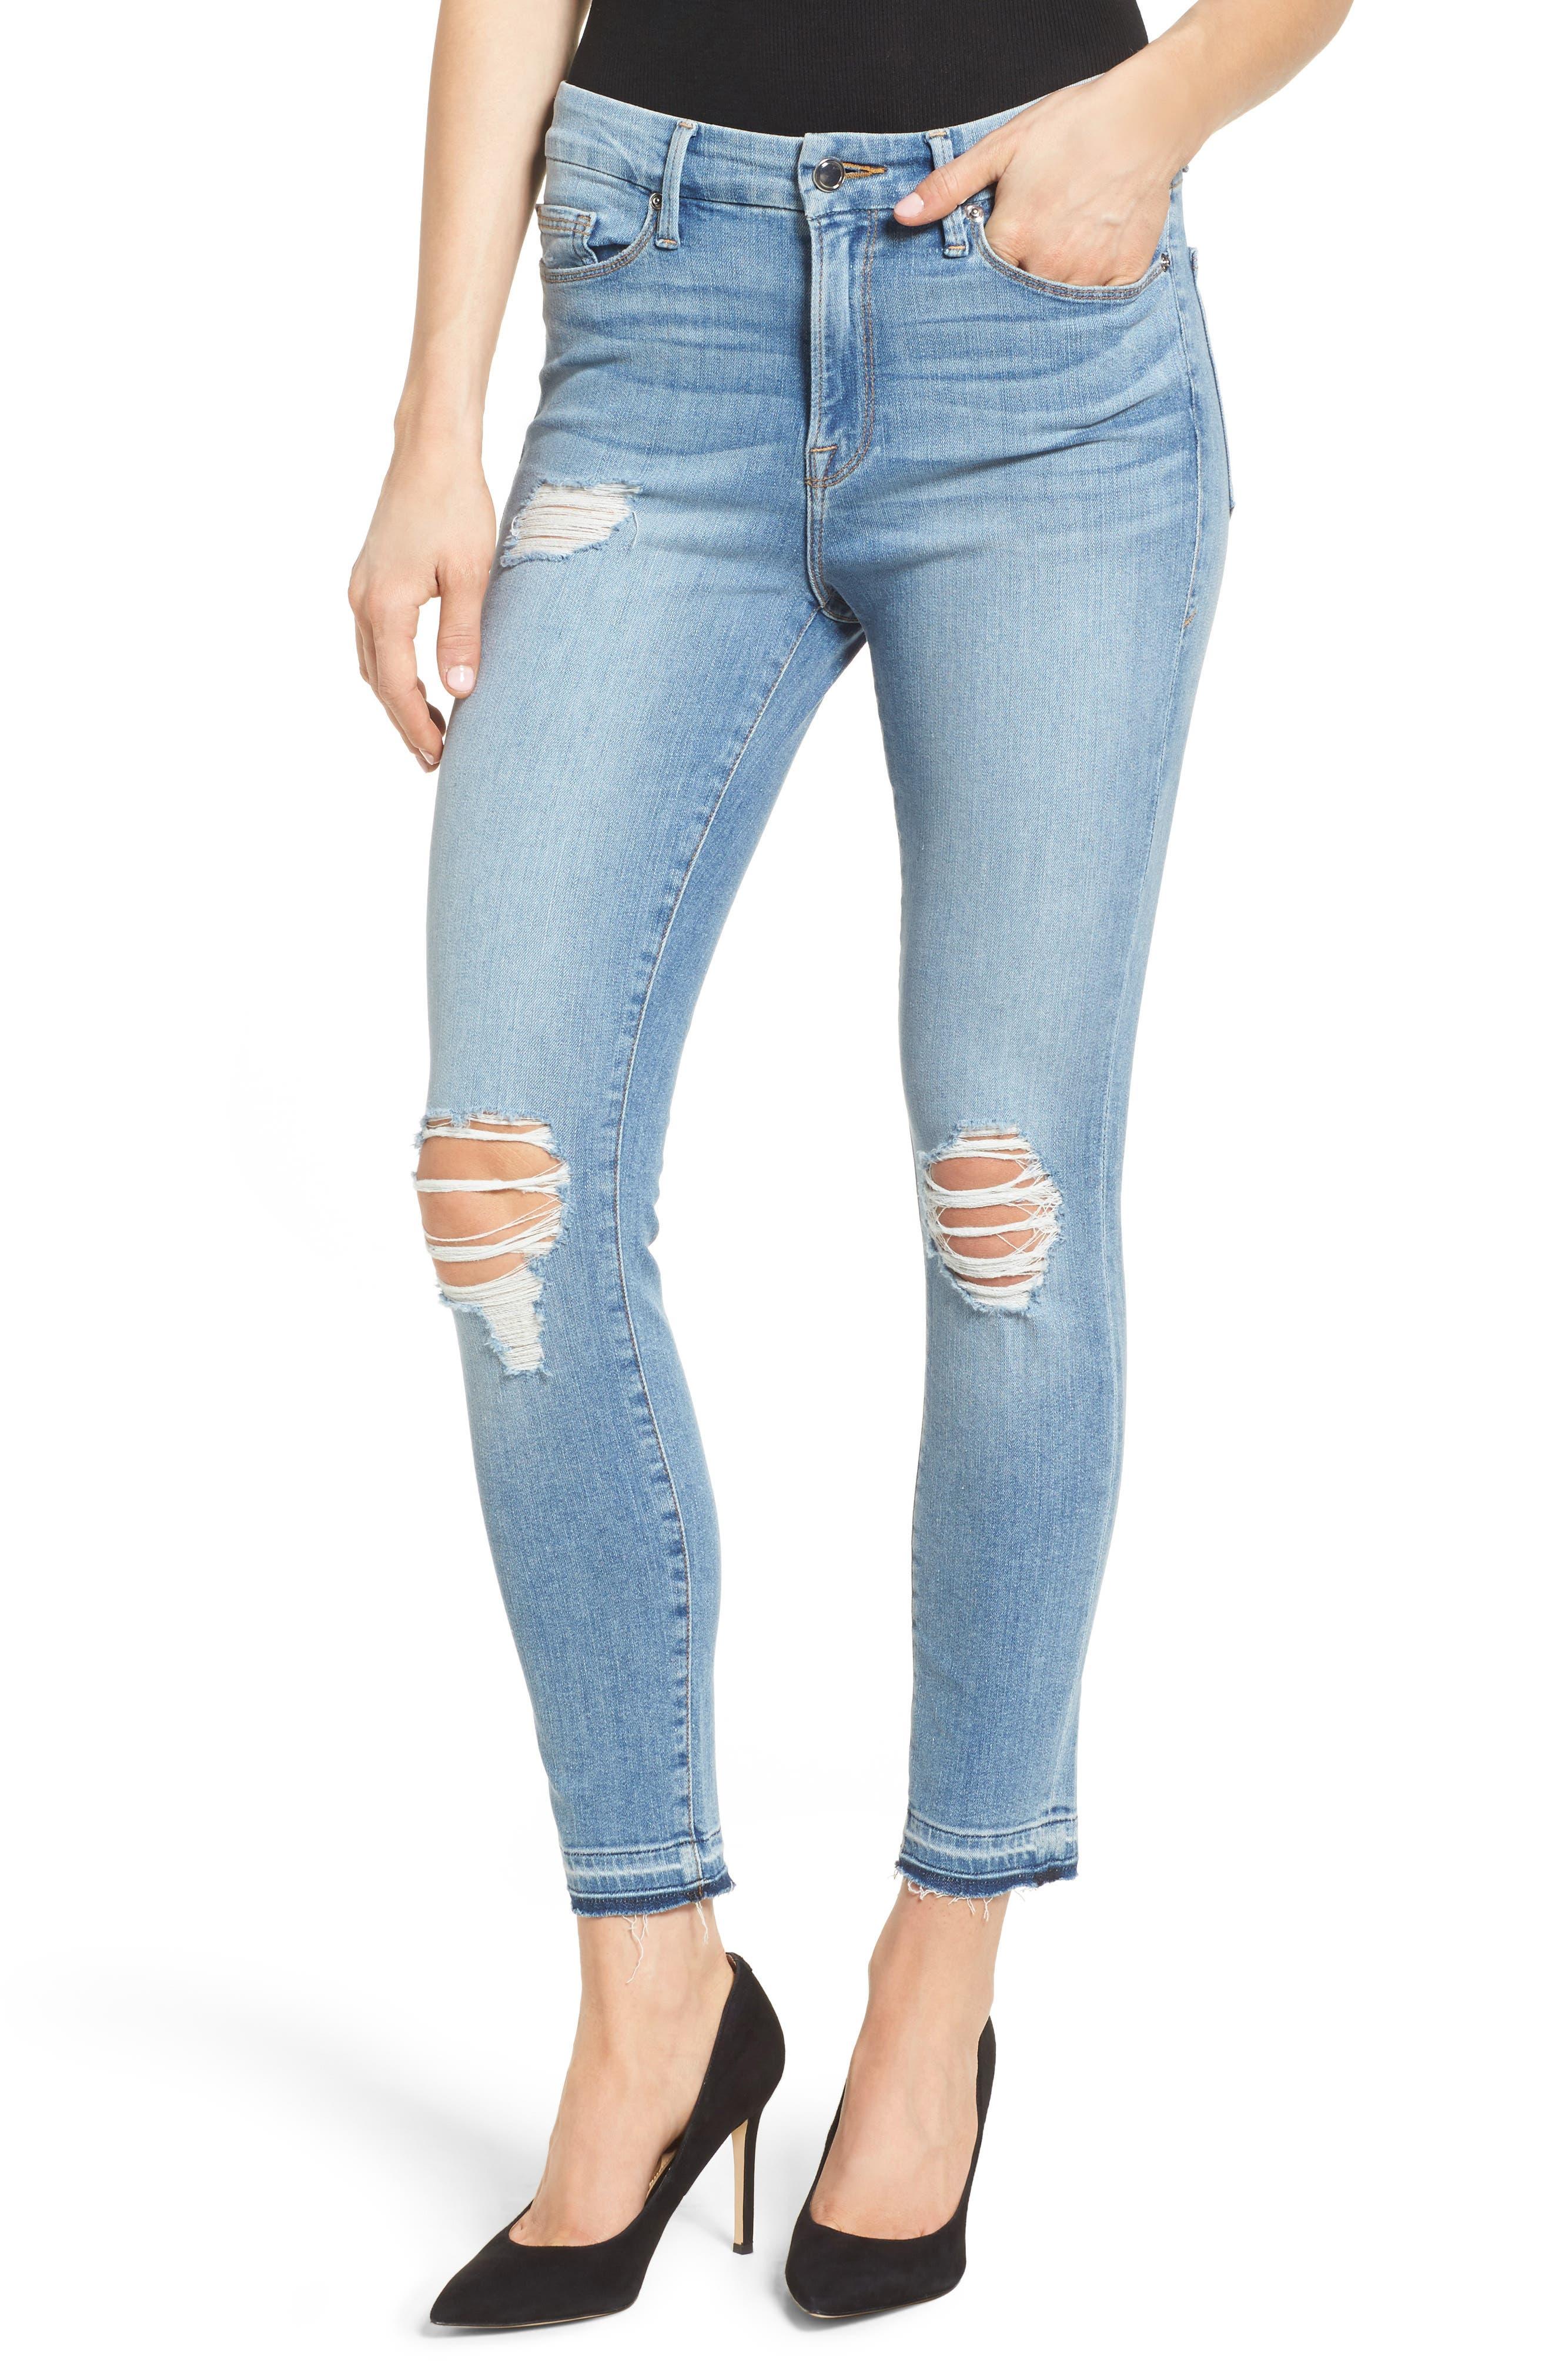 Main Image - Good American Good Legs Released Hem Skinny Jeans (Blue 023) (Extended Sizes)